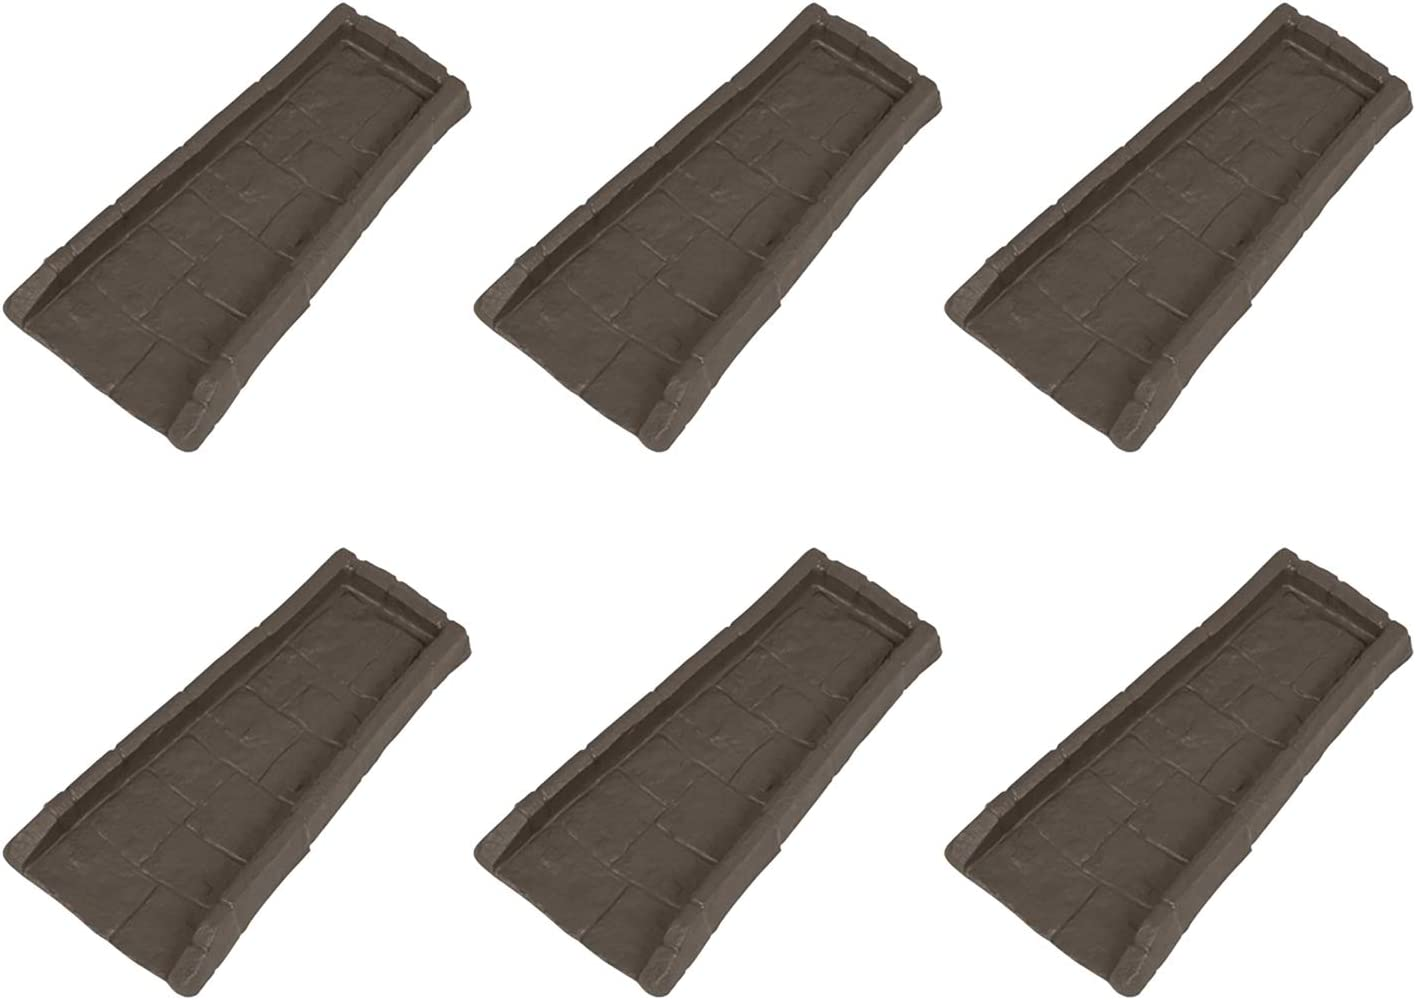 Suncast Home Splash Rain Gutter Drain Block Replacement Guard, Brown (6 Pack)